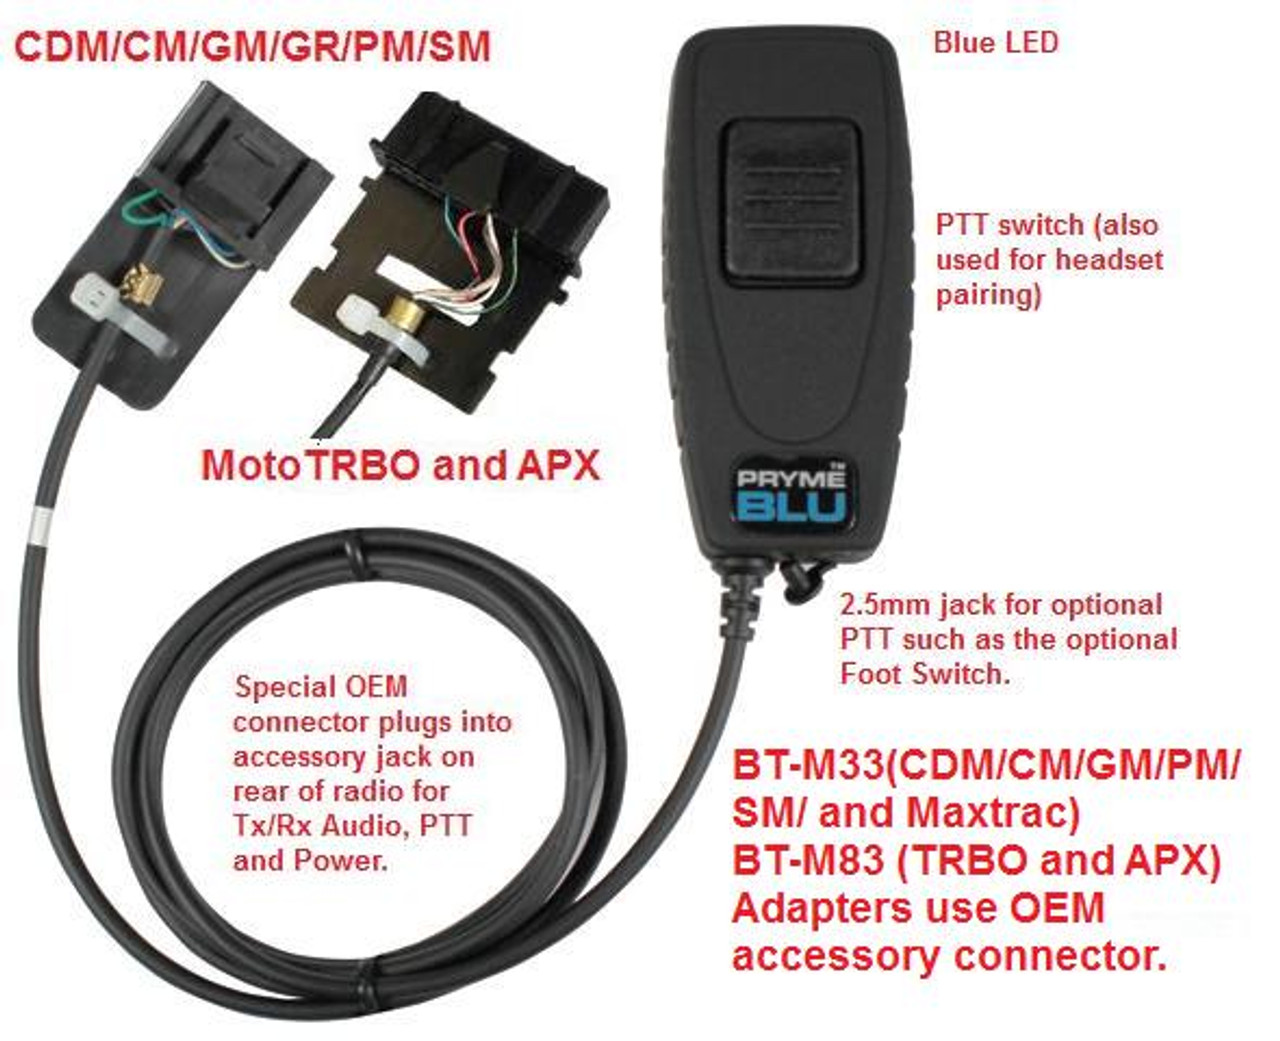 Prymeblu Bt M83 Bluetooth Mobile Radio Adapter For Motorola Hitech Wireless Store Business Two Way Radio